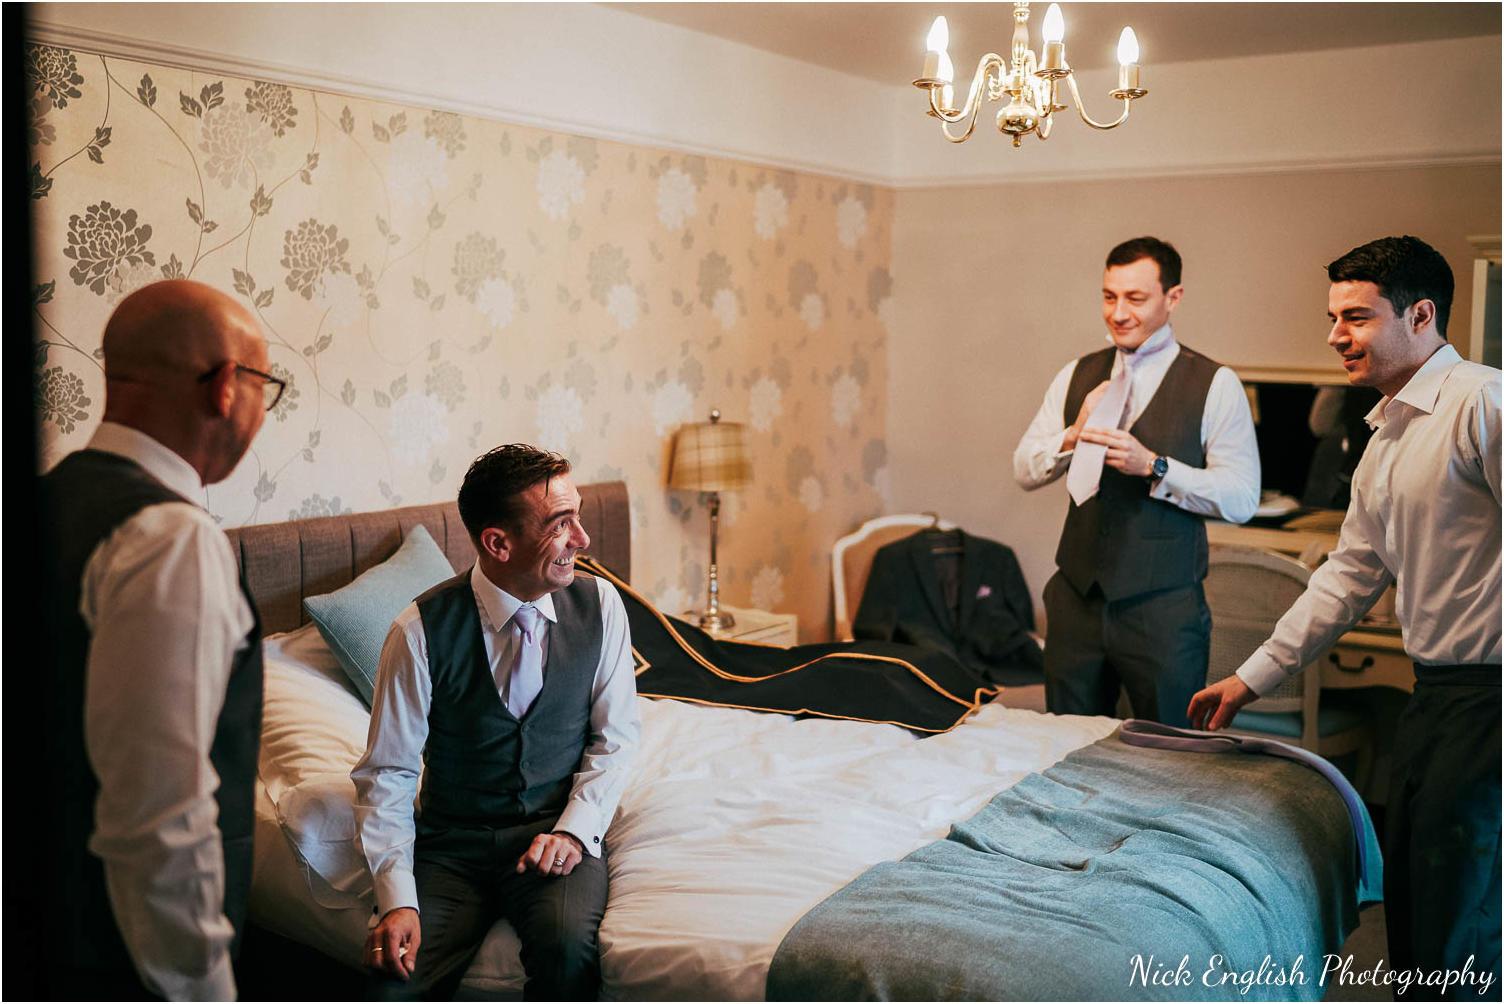 Mitton_Hall_Wedding_Photographer_2018-12.jpg